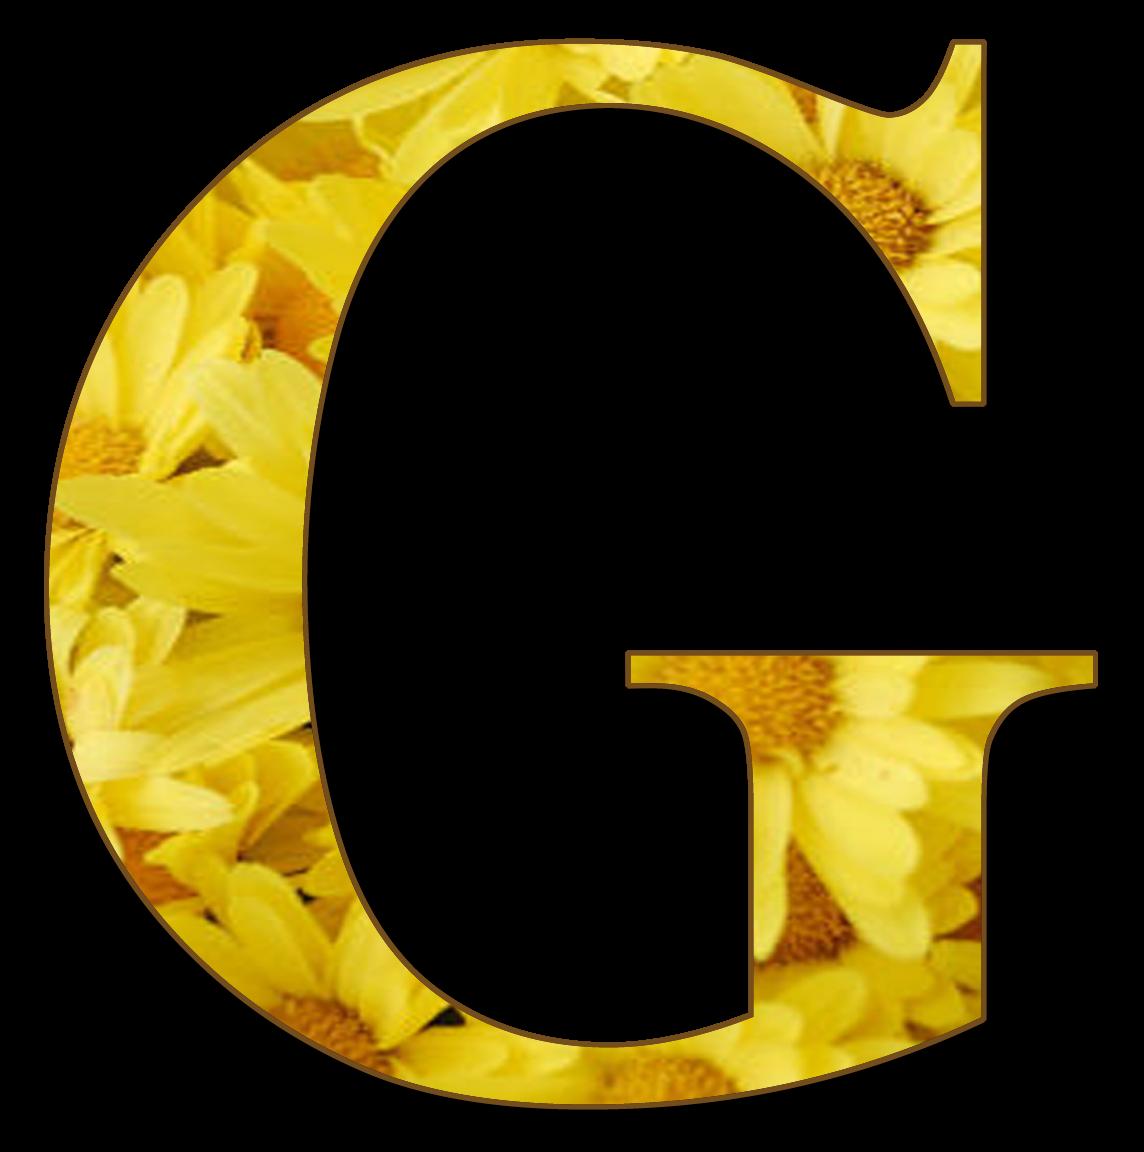 granny enchanted u0026 39 s blog  free yellow floral alphabet